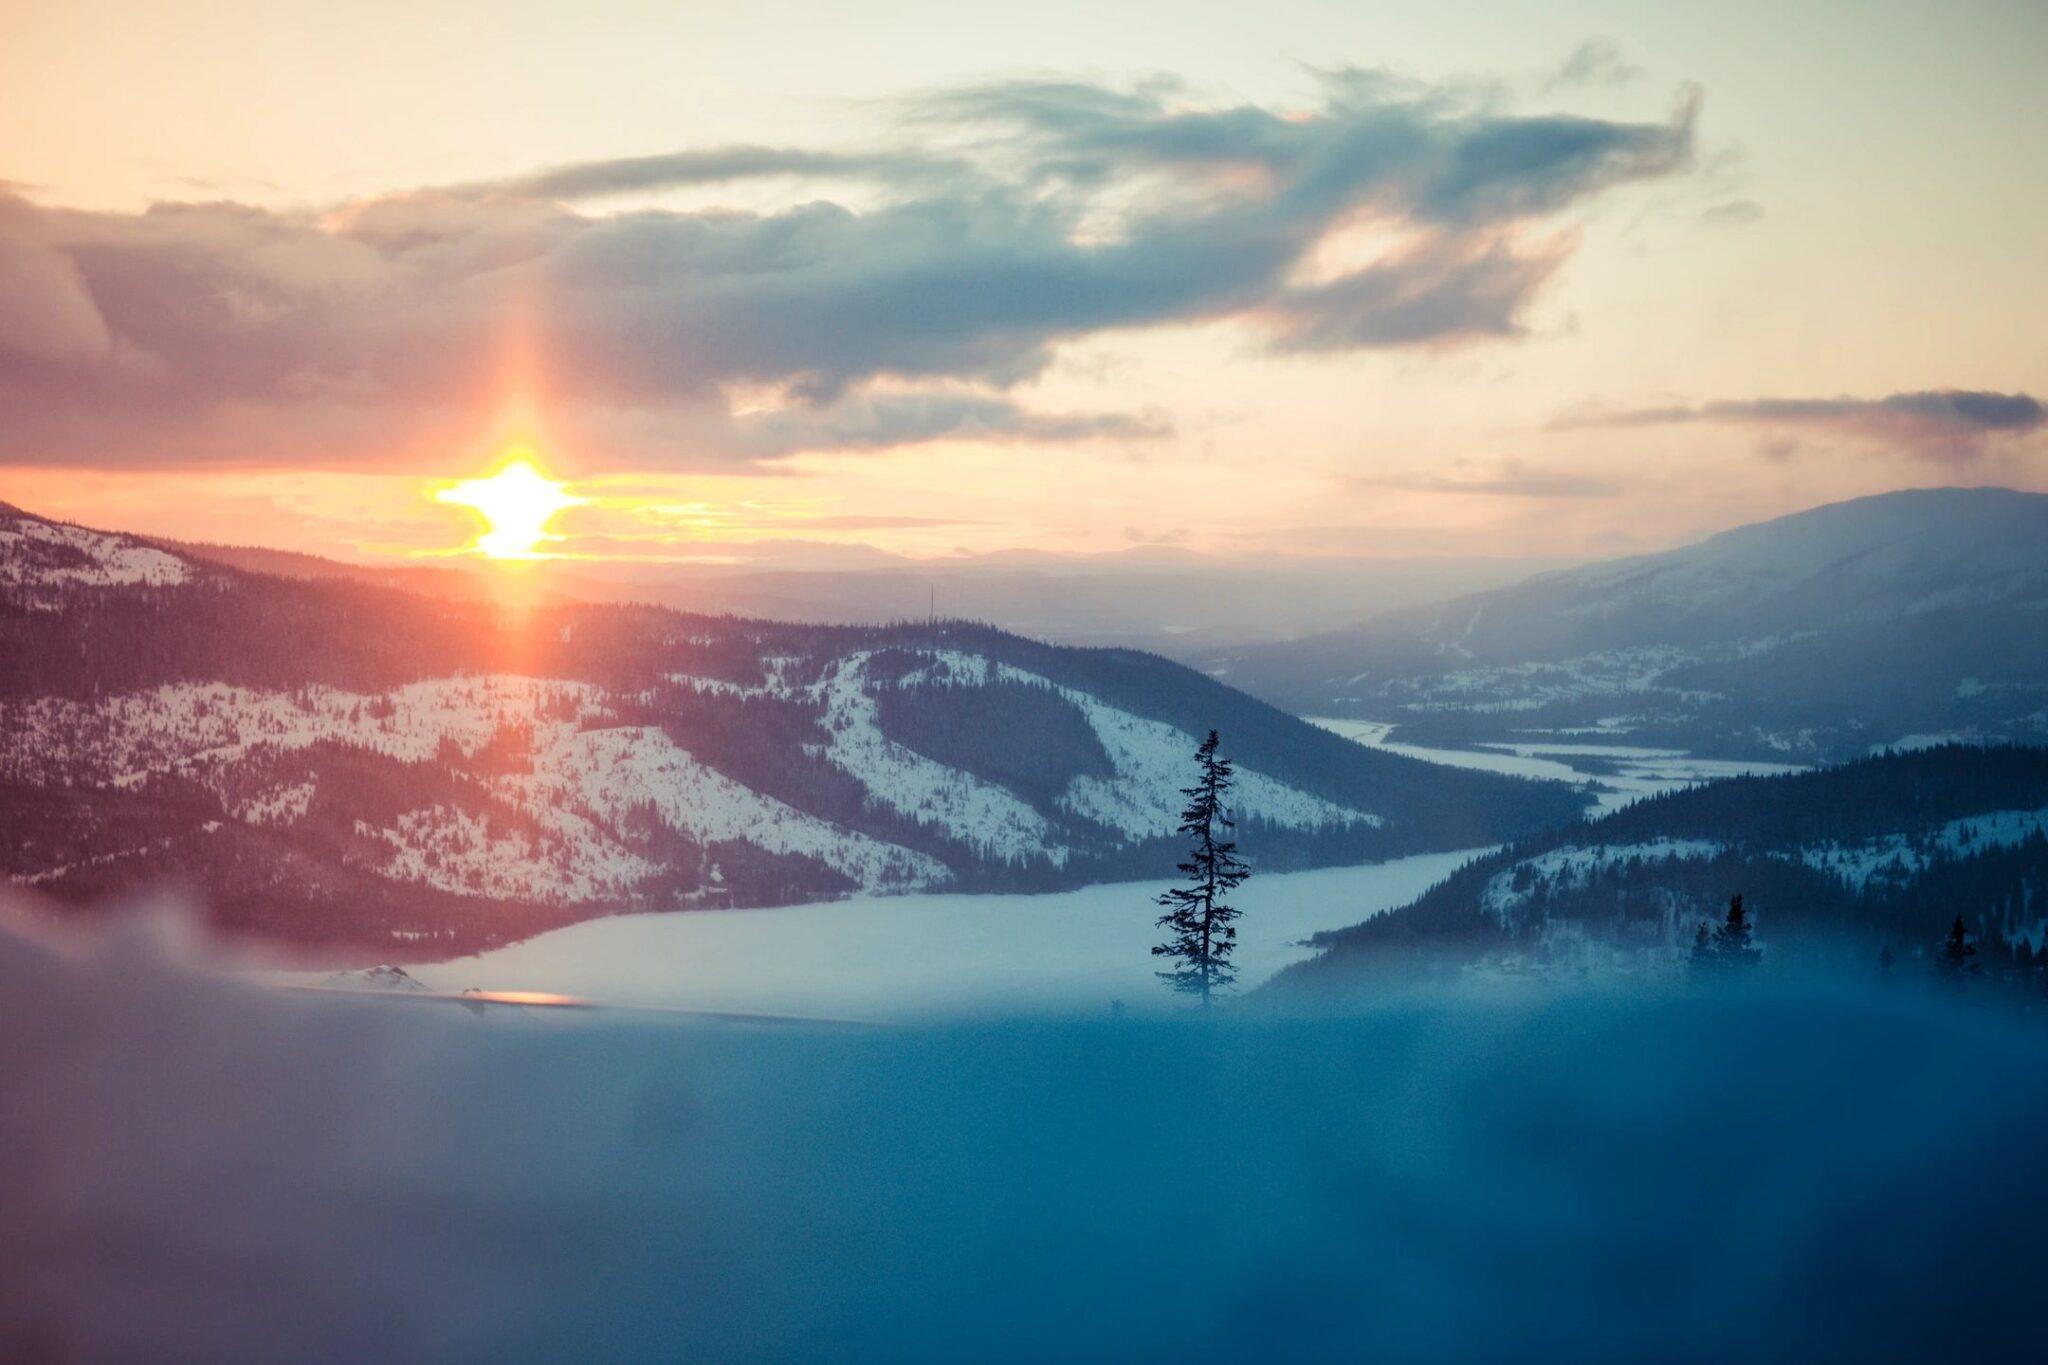 Non-skiing Winter Holiday In Switzerland